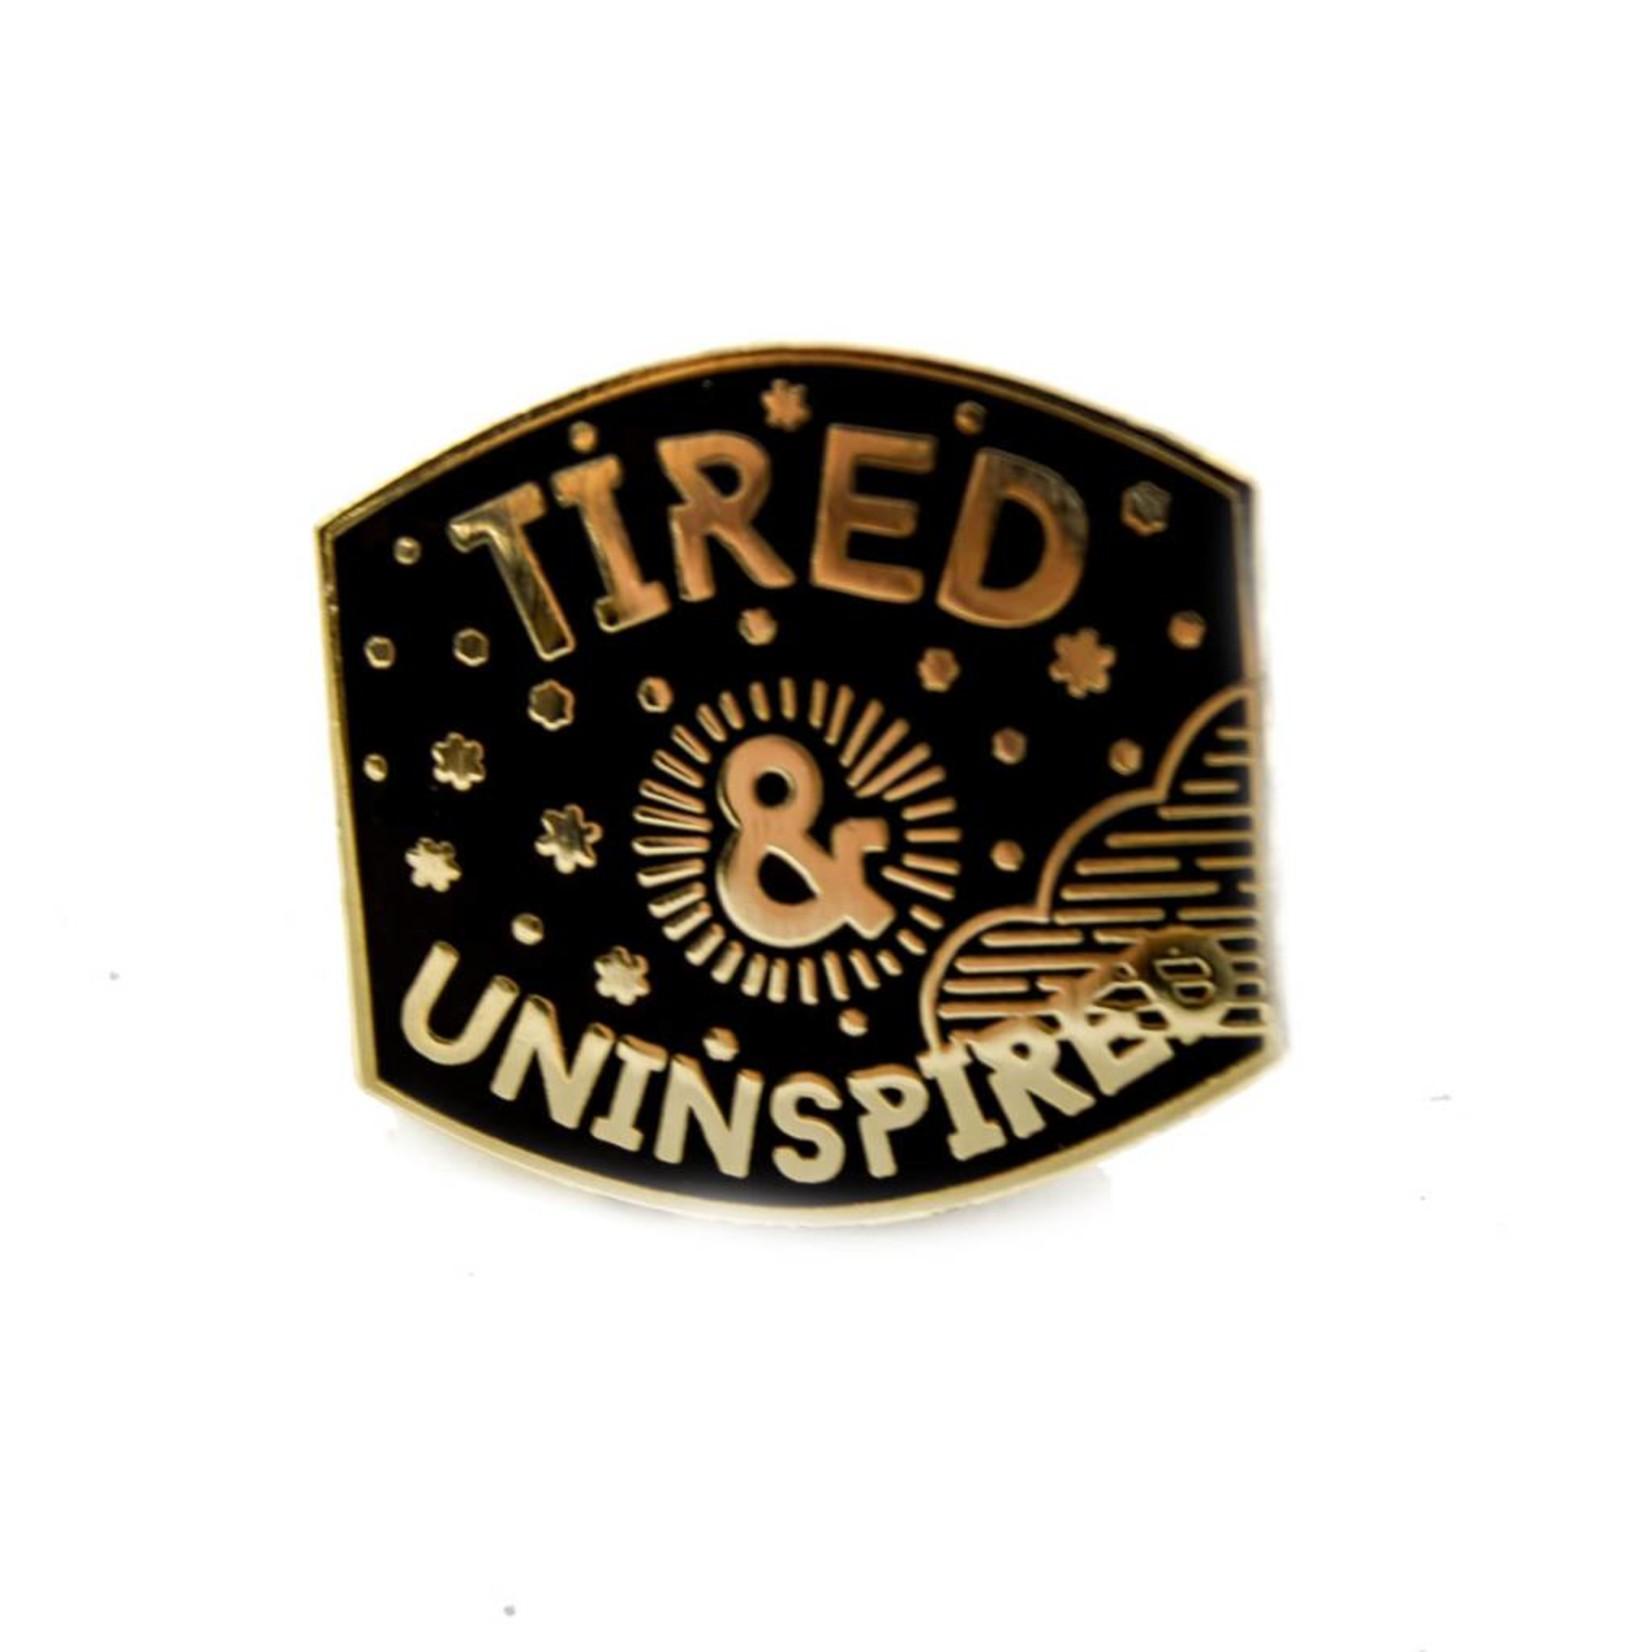 1606 / Sunset Avenue Ceramics Mini Tired Uninspired Enamel Pin